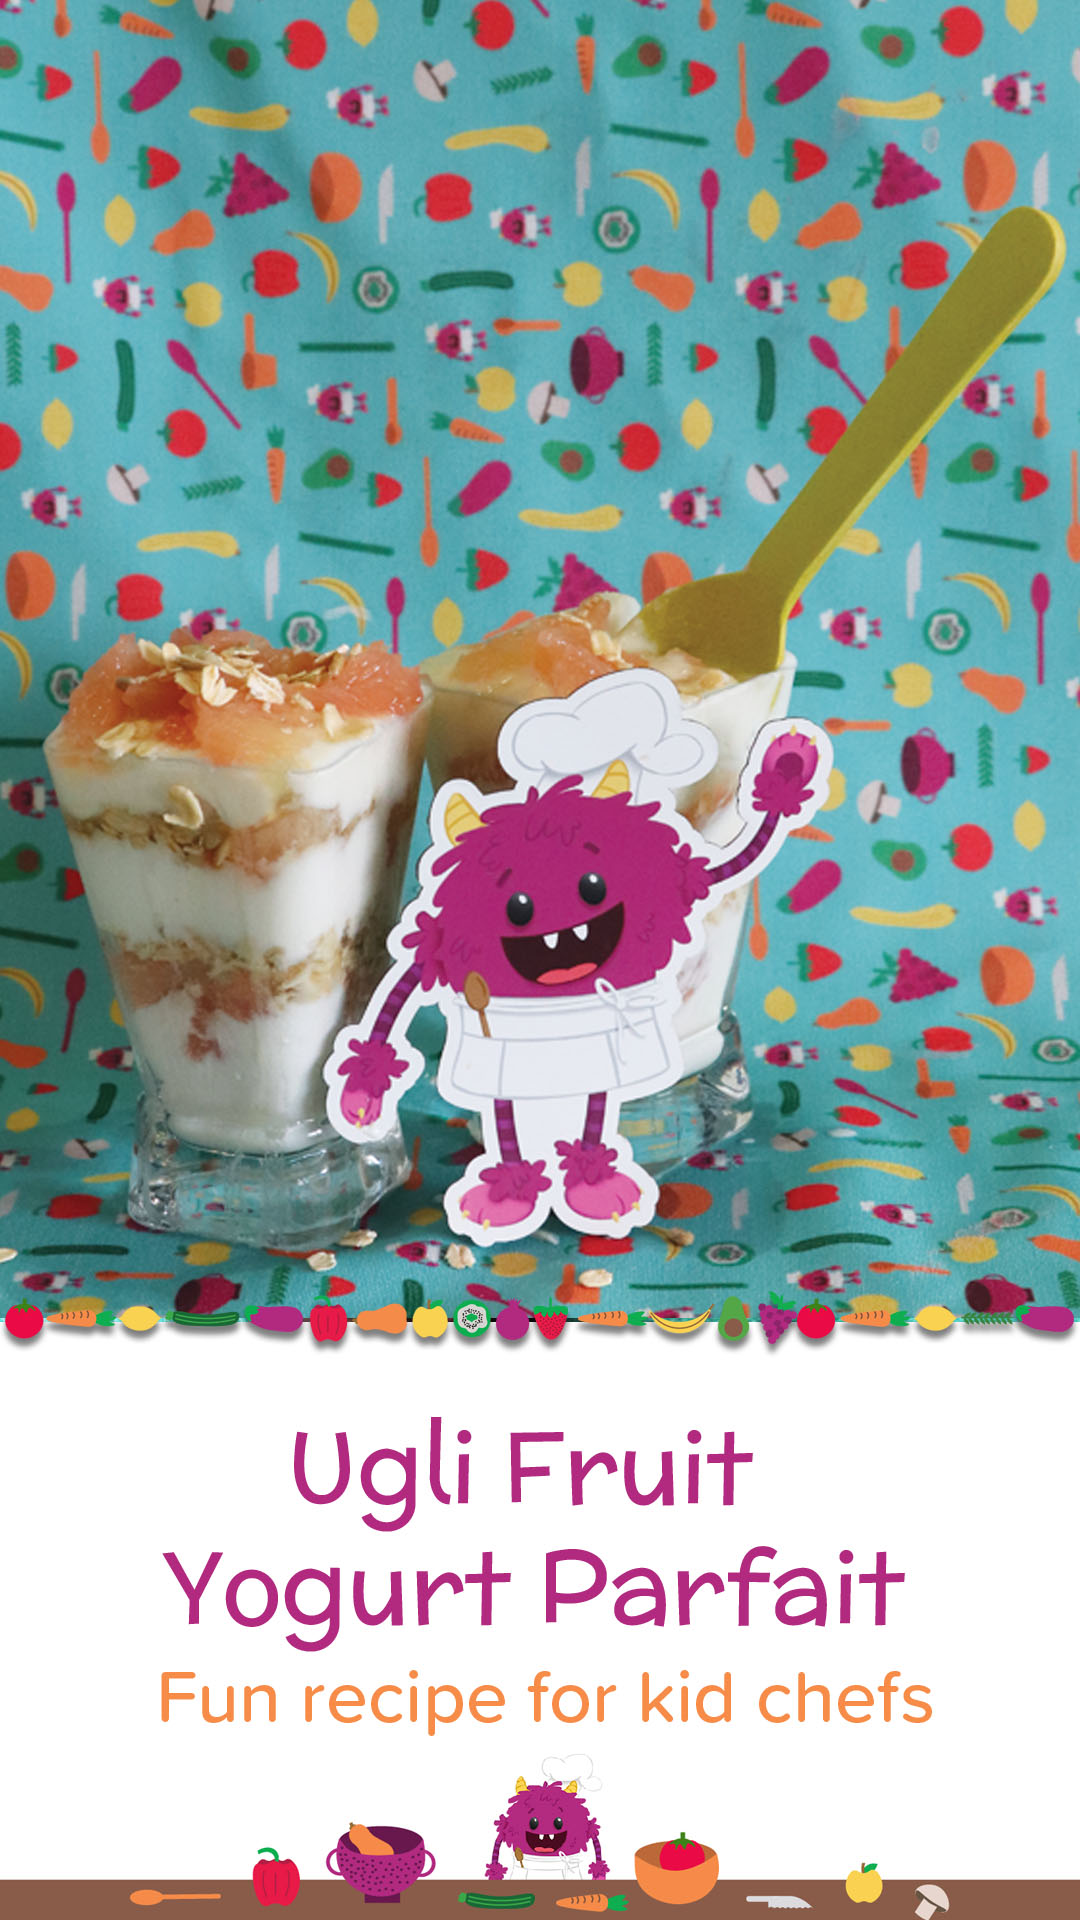 u-is-for-ugli-fruit-ugli-fruit-yogurt-parfait-nomster-chef